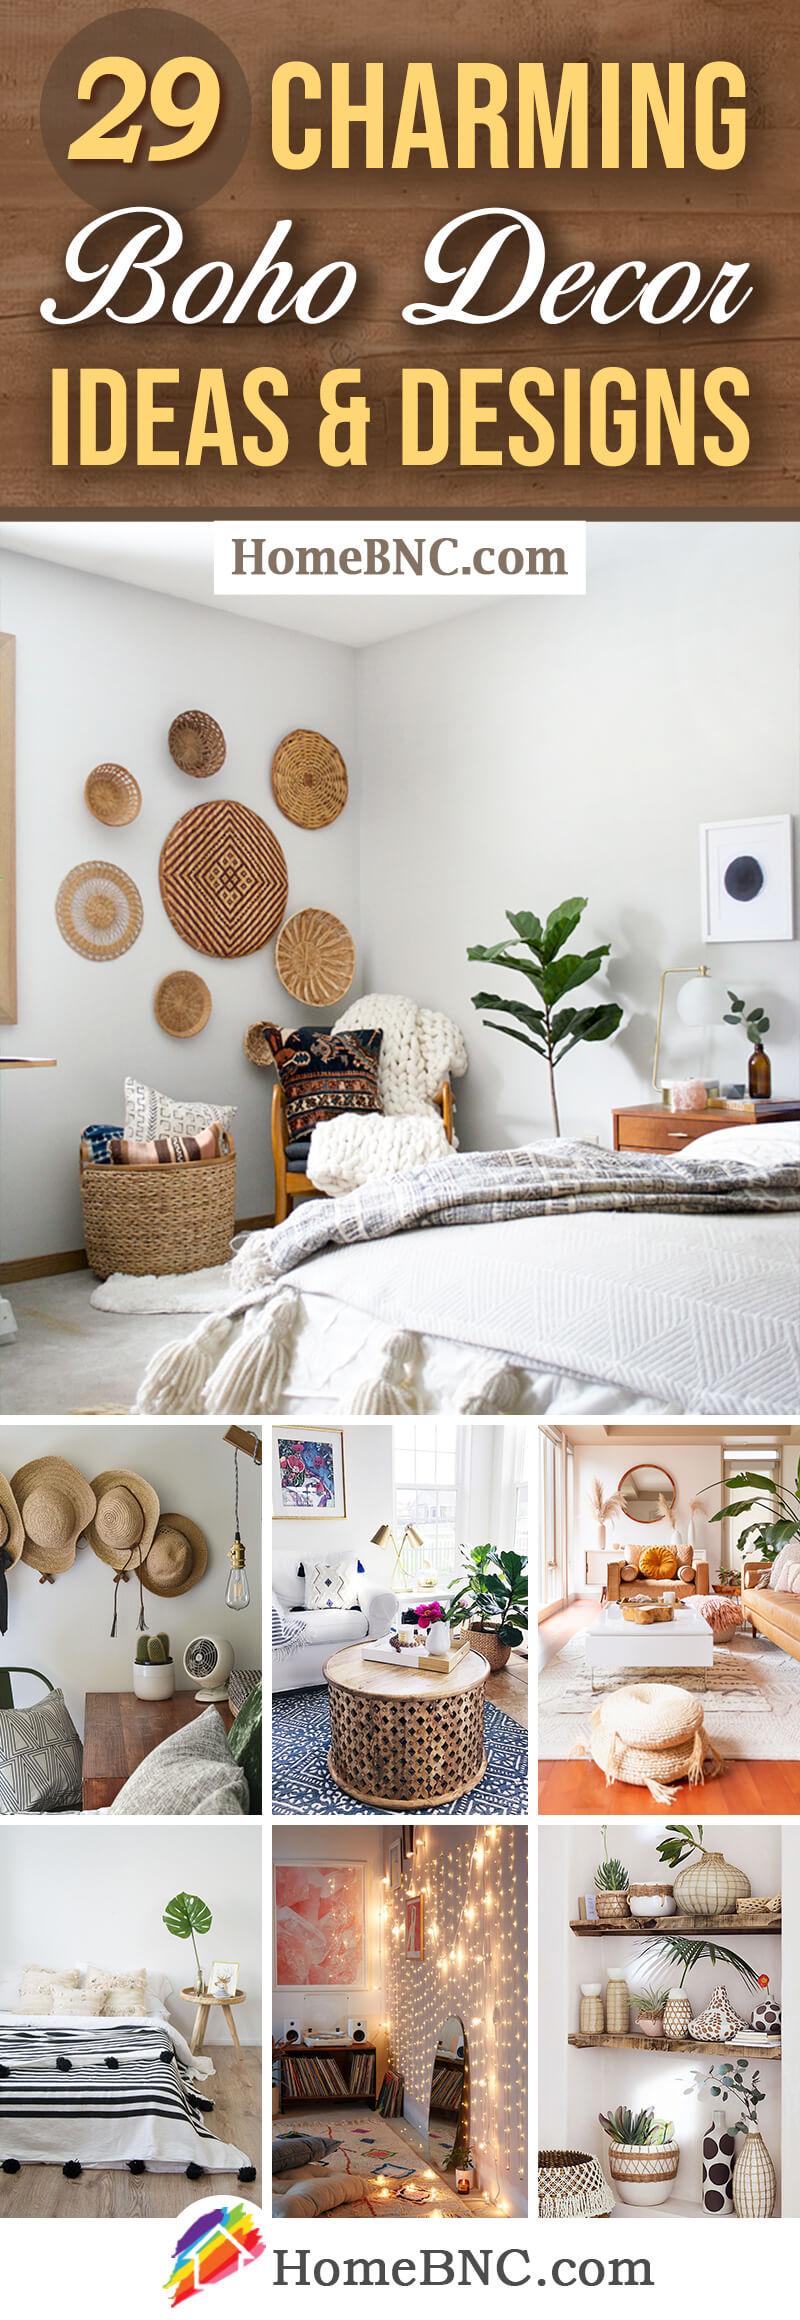 Best Boho Decor Ideas and Designs